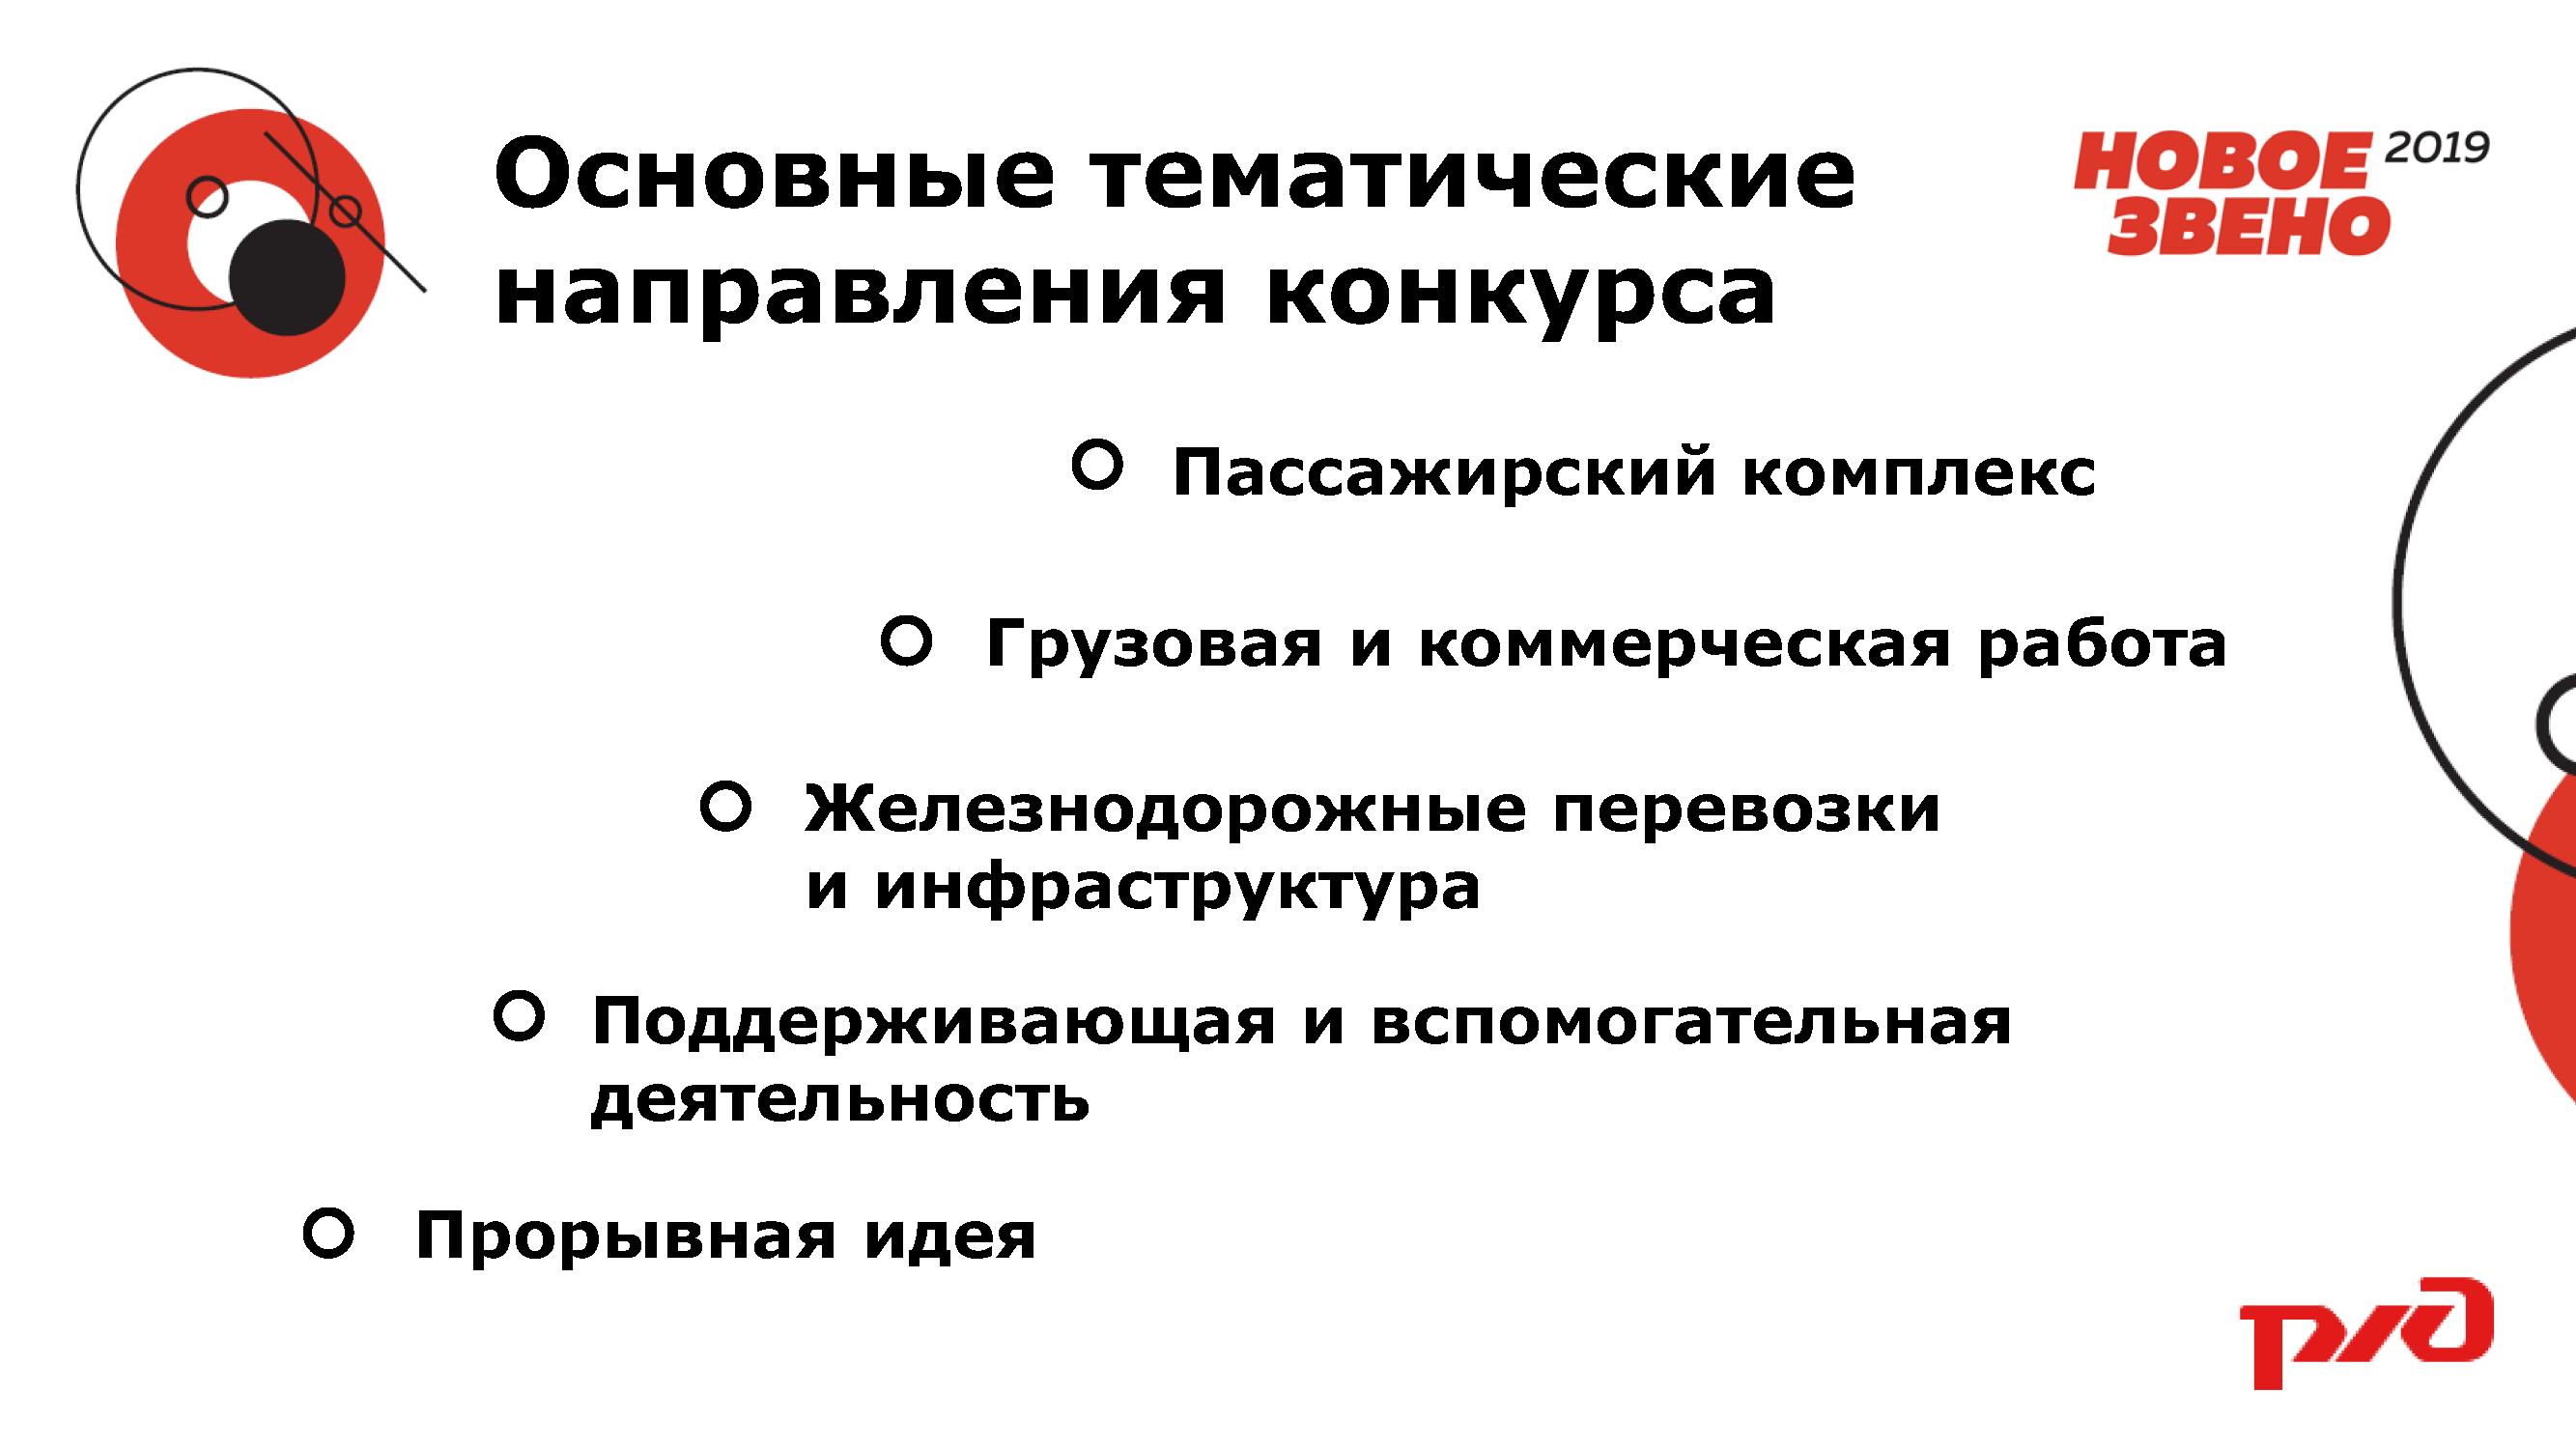 Общая презентация_Новое звено ИТОГ_Страница_6